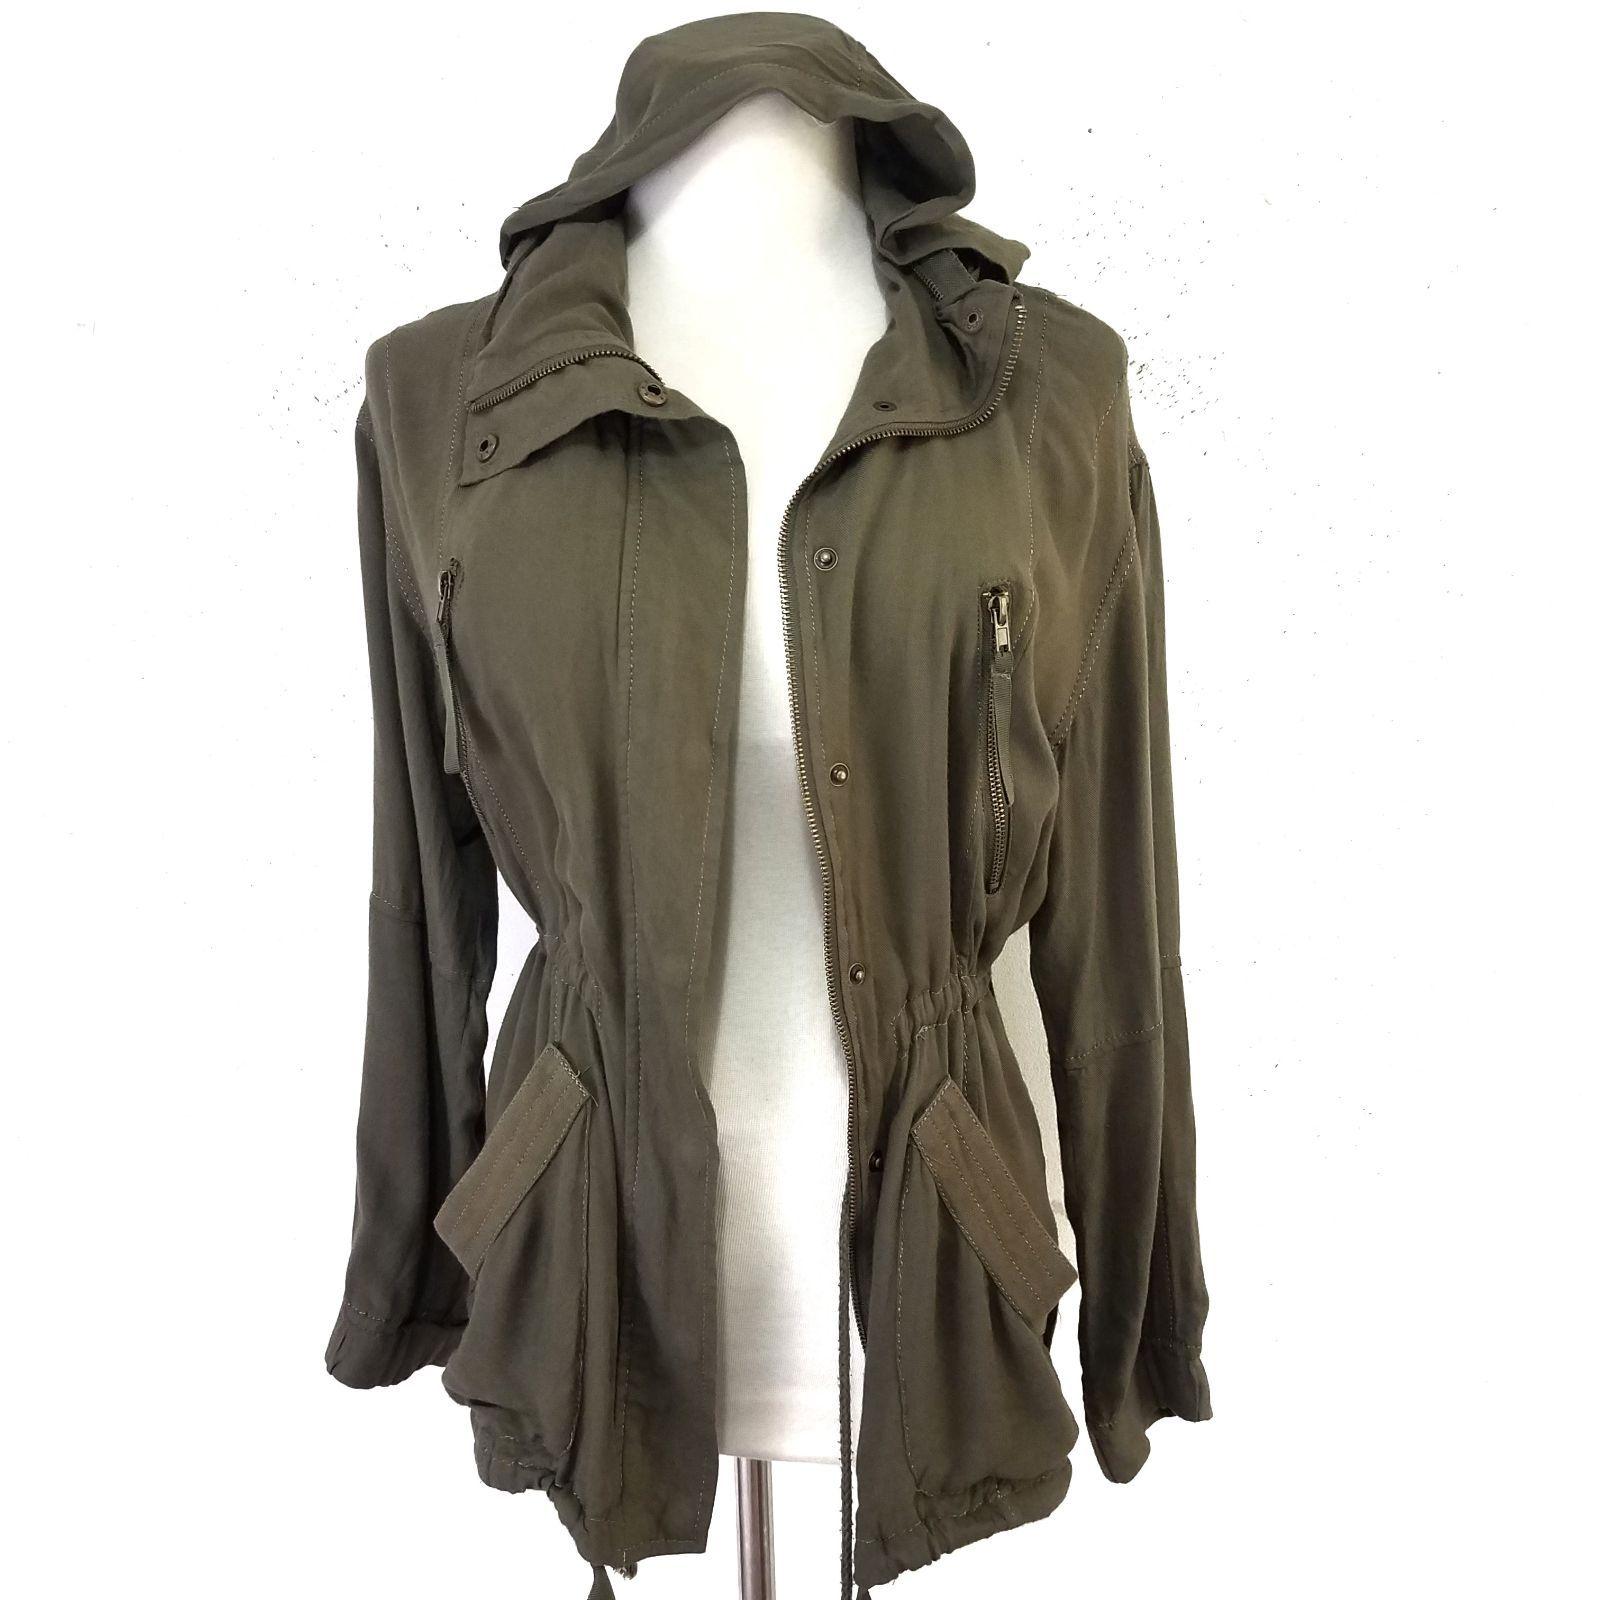 Women S Utility Jacket Sz S Runs Big Mercari Jacket Fashion Style Forsale Hoodie Harpfreak Womens Utility Jacket Long Outerwear Jacket Long Outerwear [ 1600 x 1600 Pixel ]